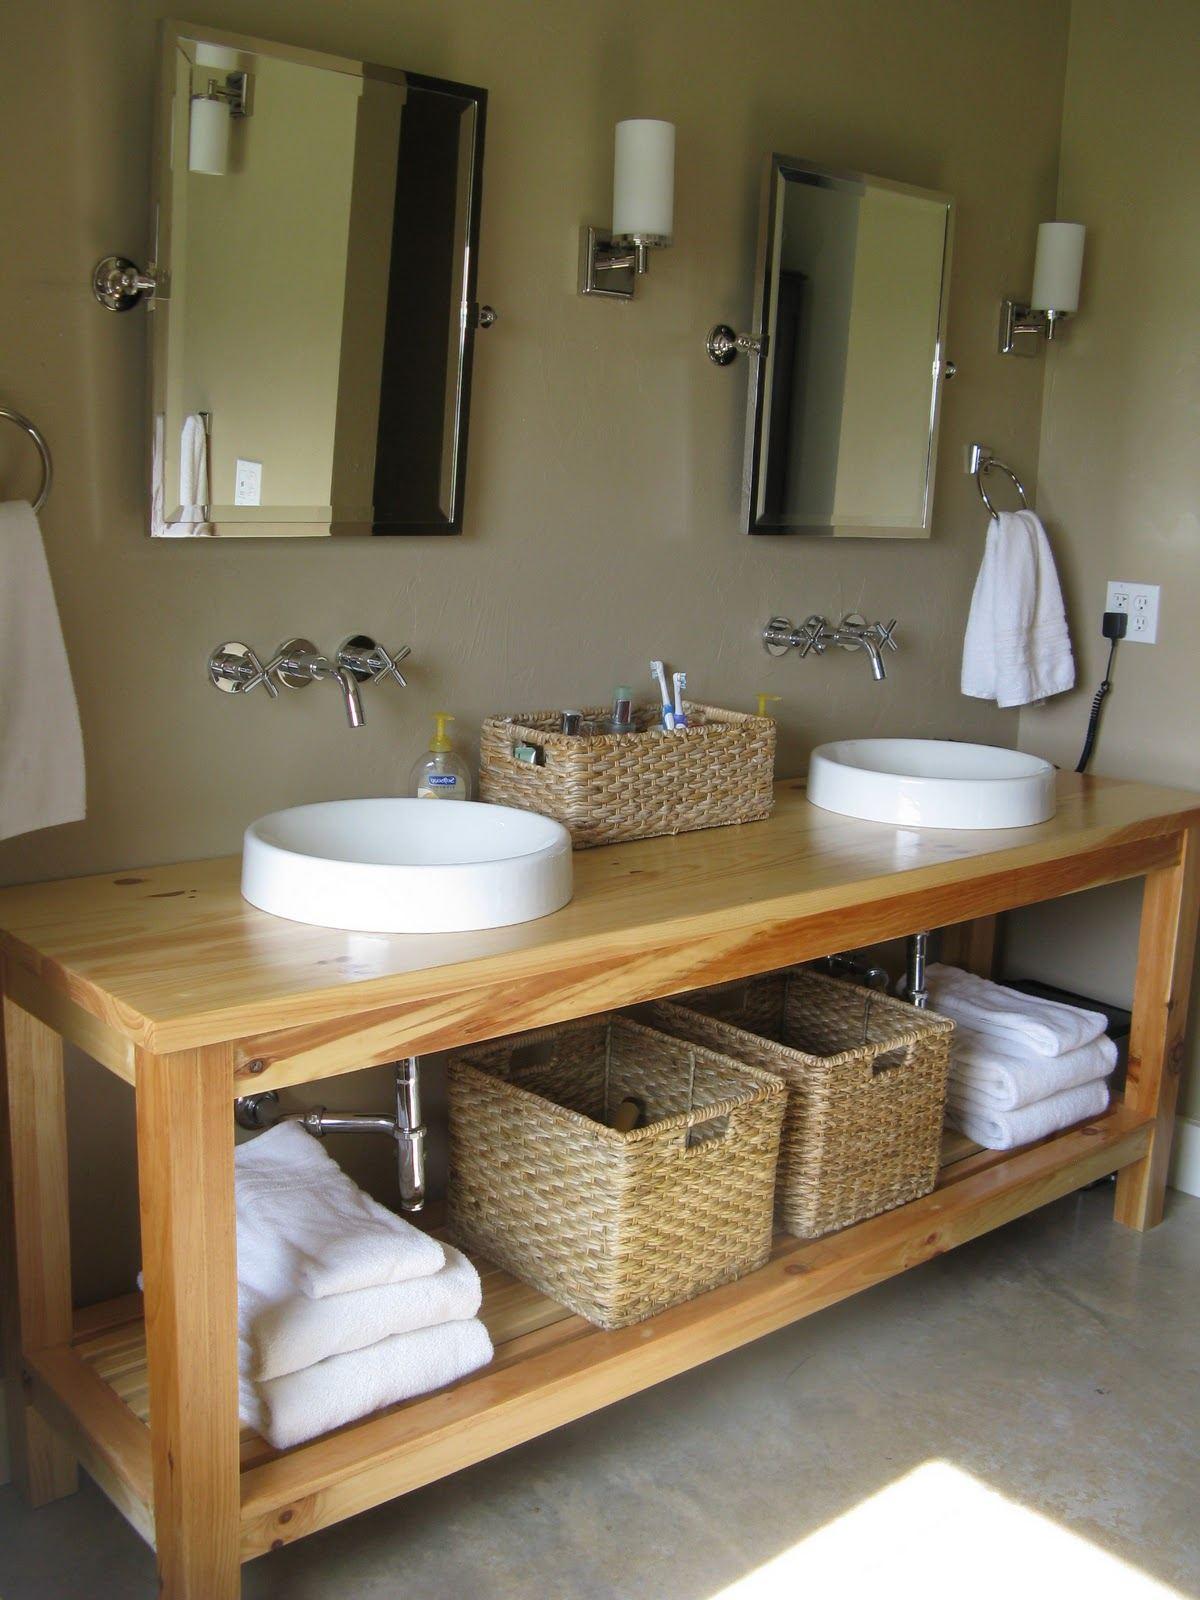 IKEA Small Bathroom Storage (4)